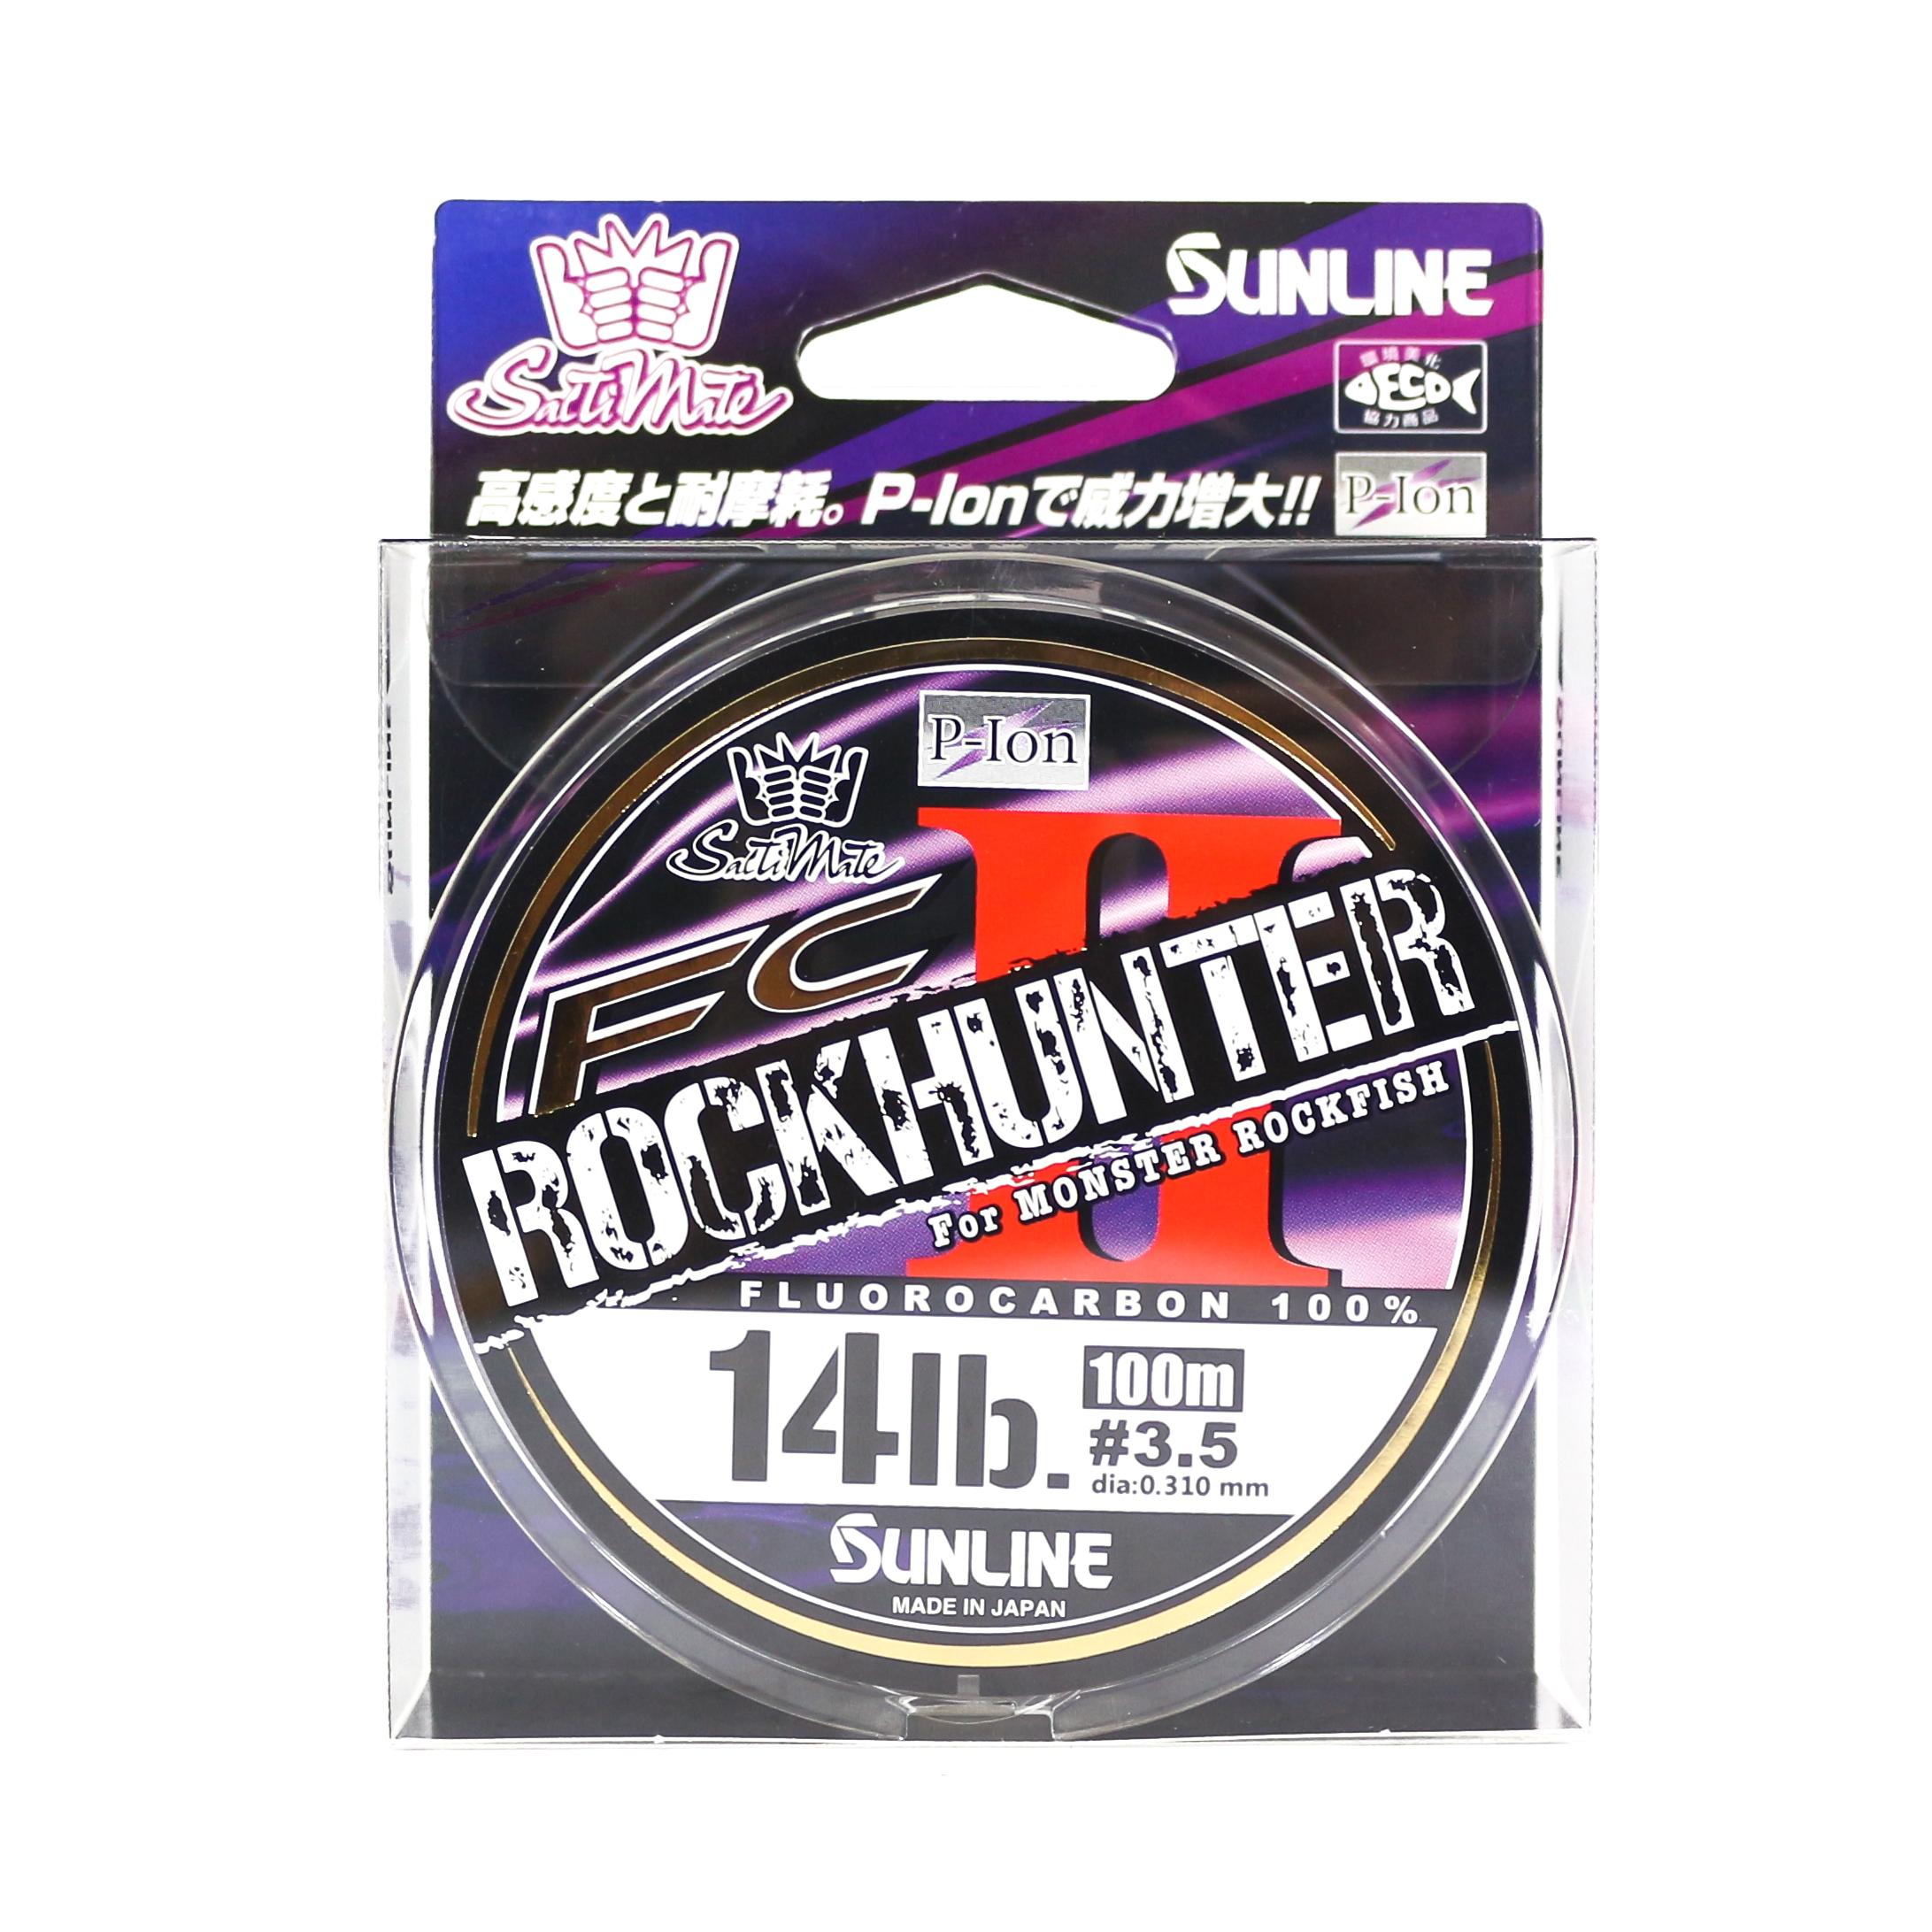 Sunline Fluorocarbon Line Rock Hunter II 100m 14lb , 0.31mm (9109)